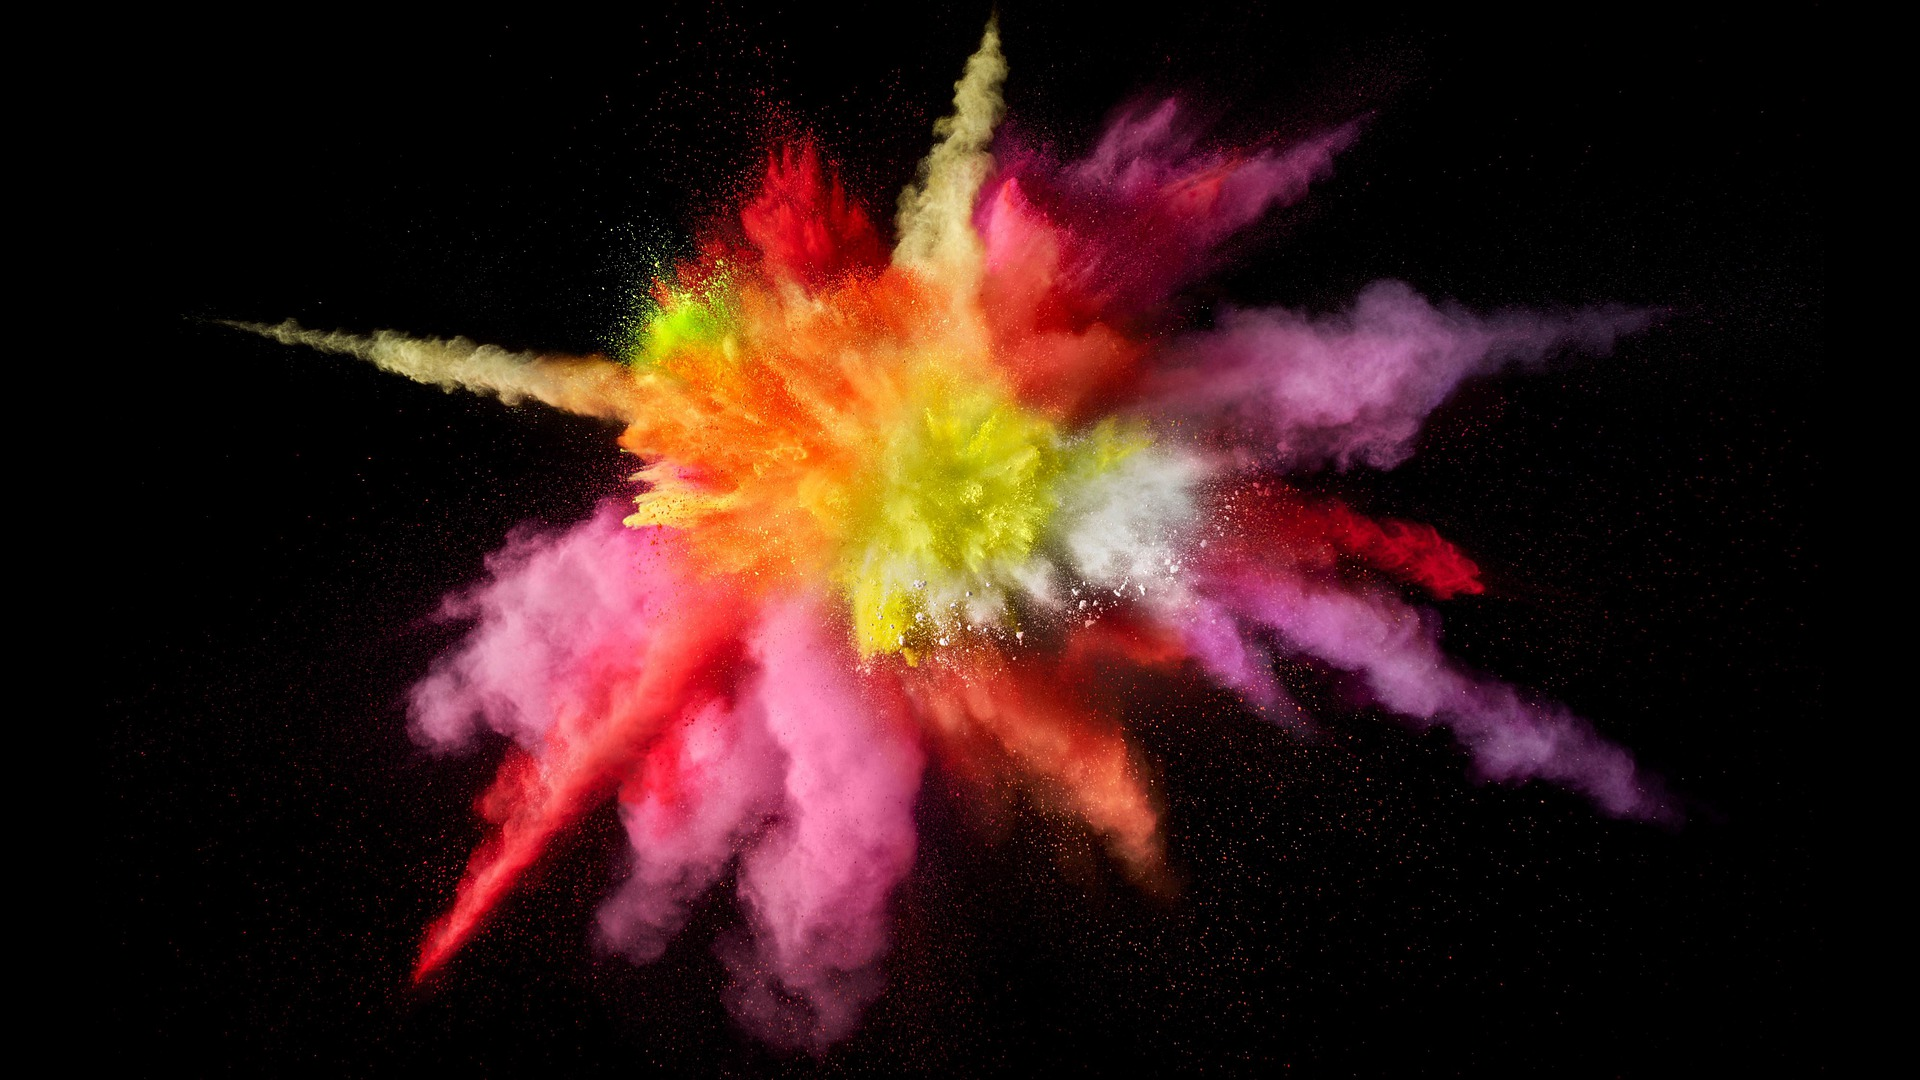 multicolors-4674368_1920.jpg